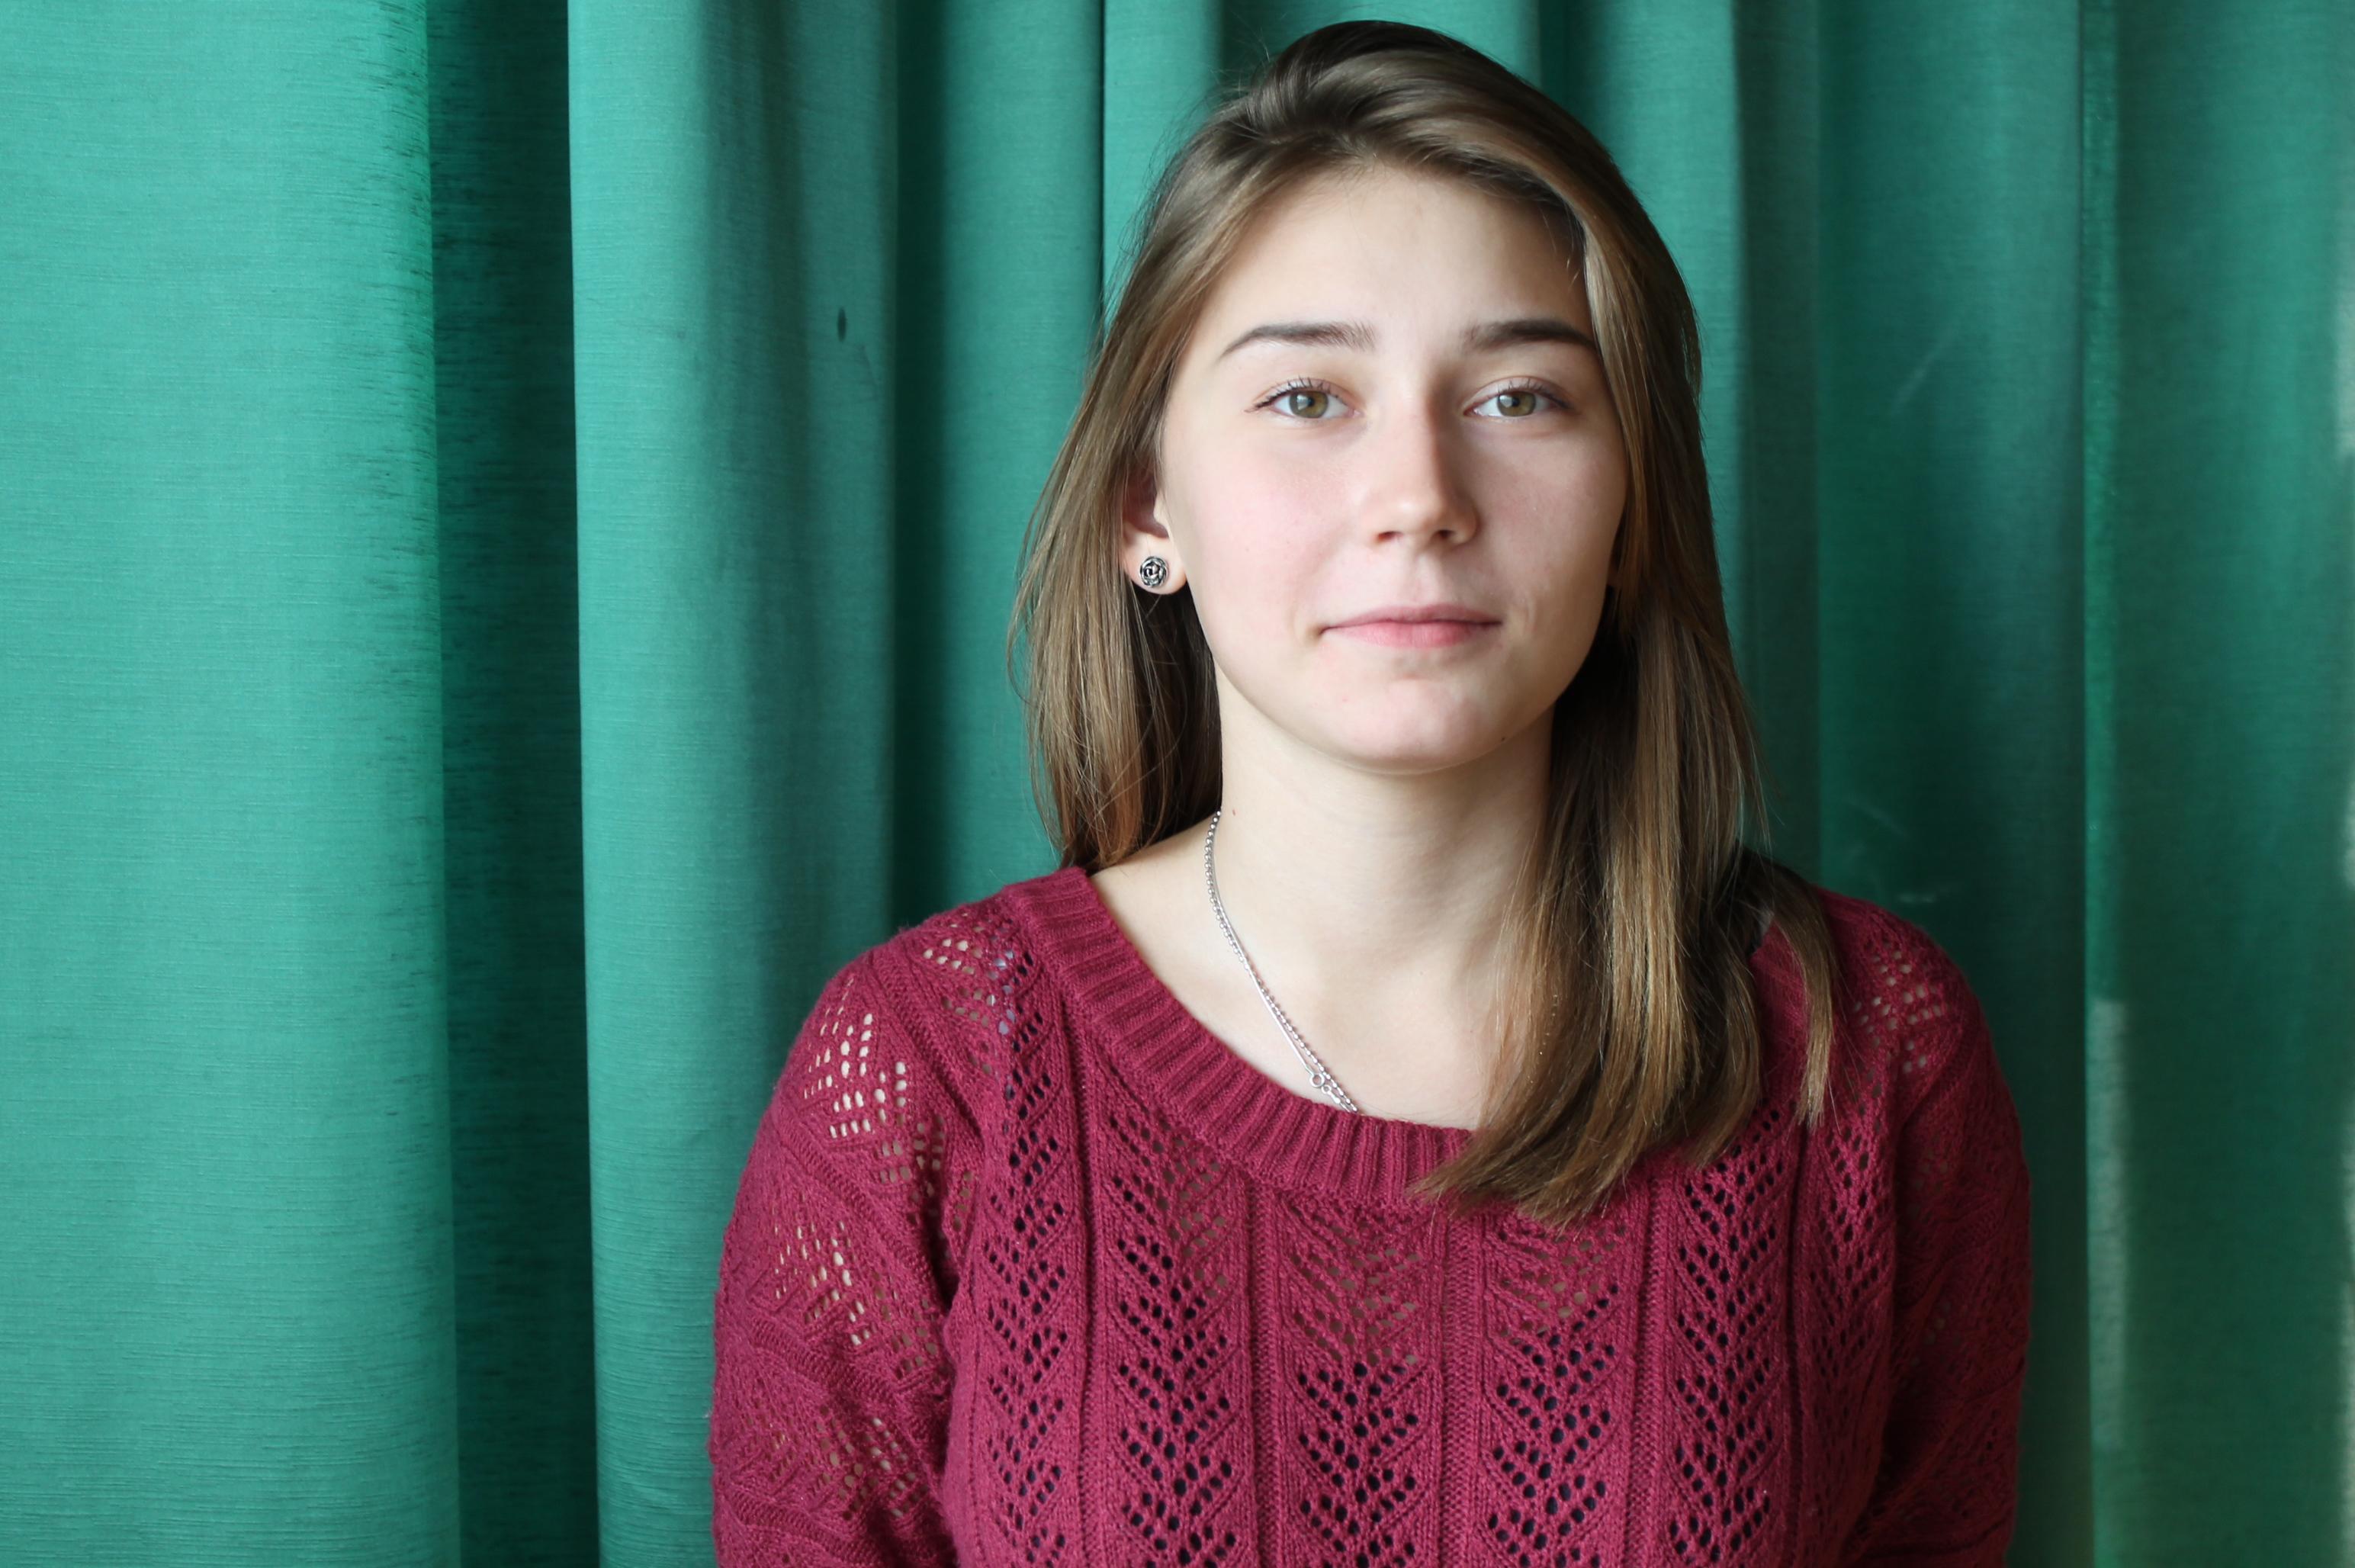 Курыло Галина, студентка Ю-32